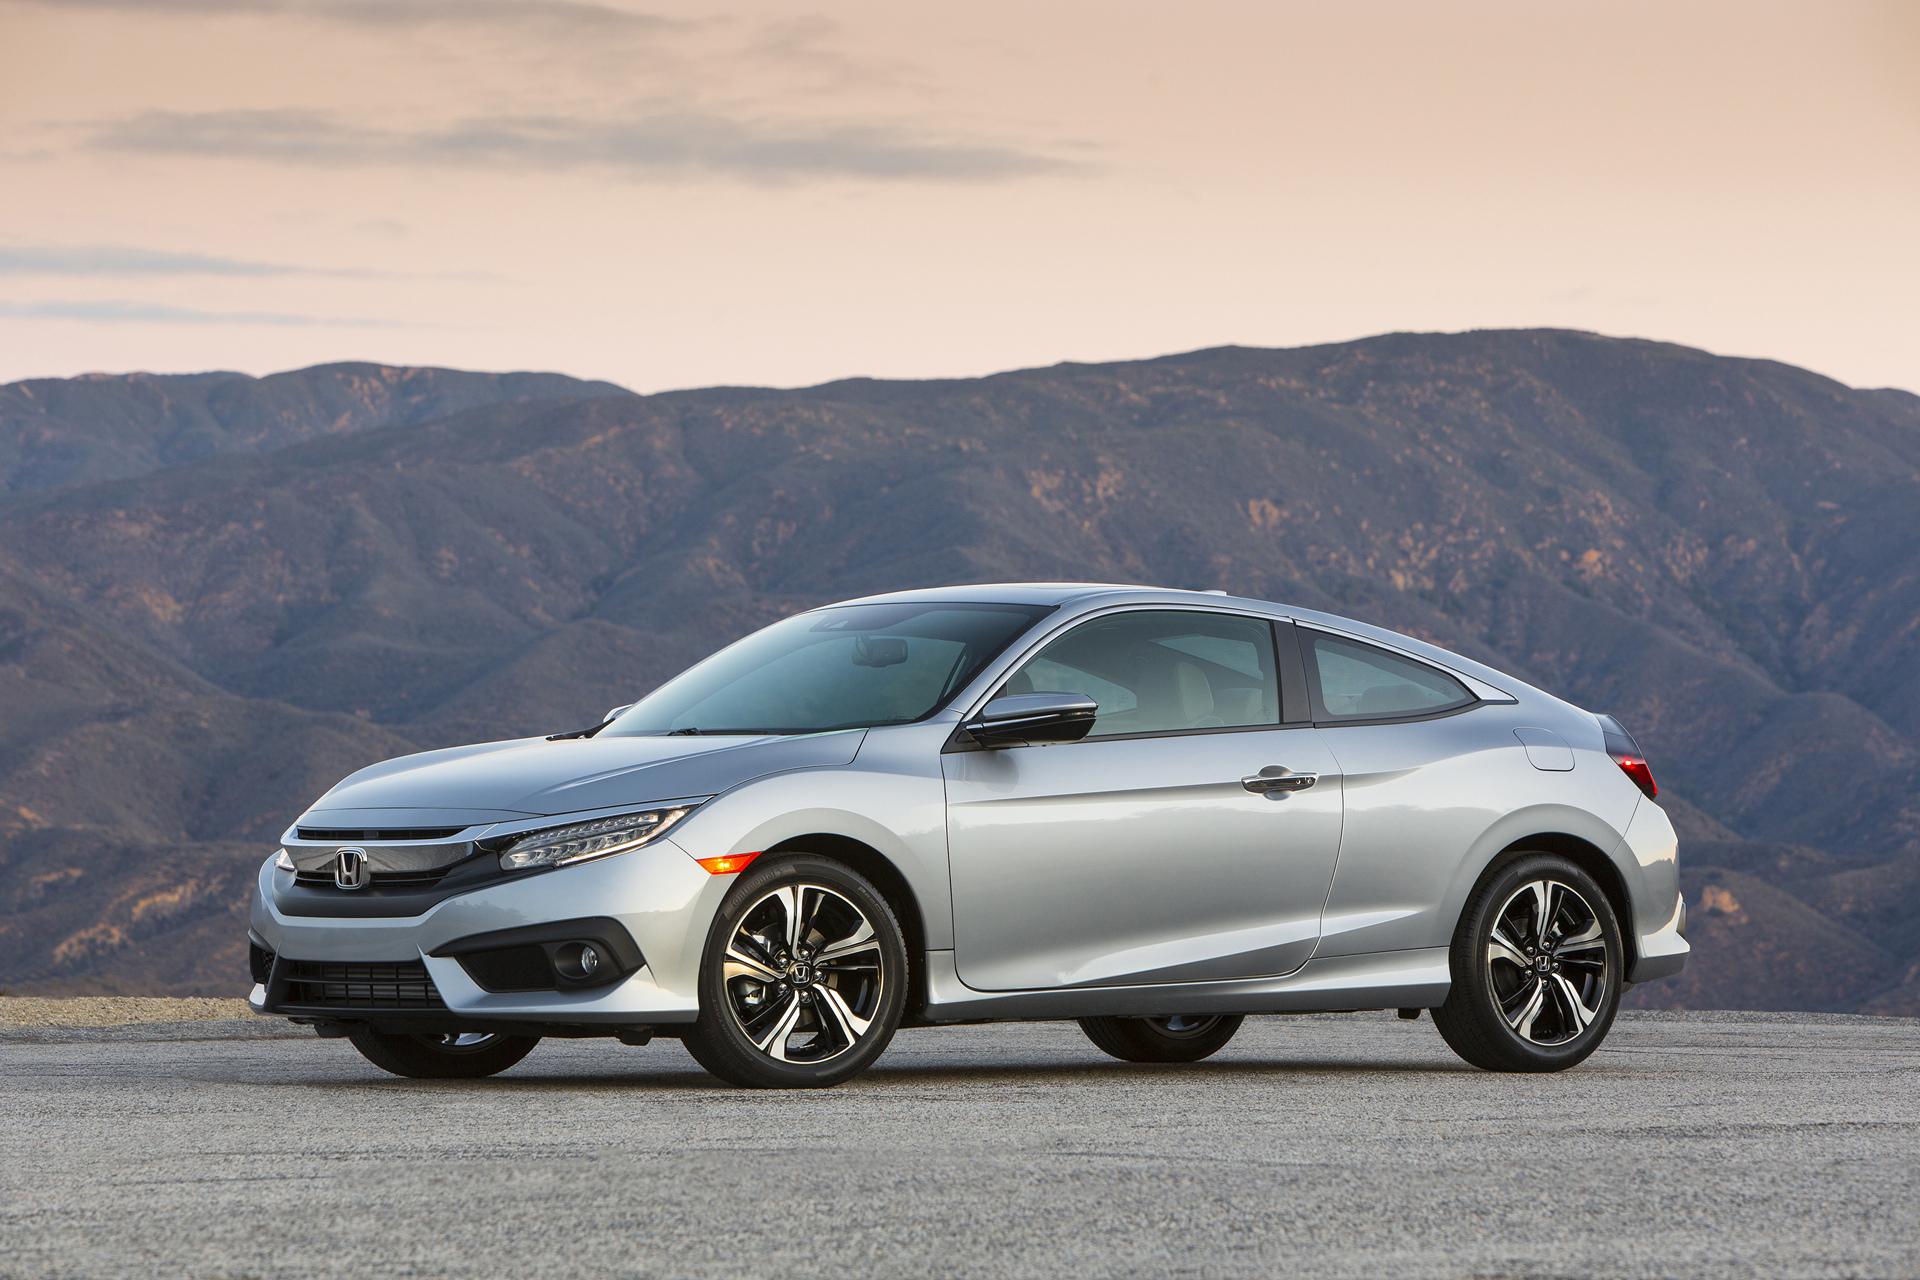 2017 Honda Civic Coupe © Honda Motor Co., Ltd.